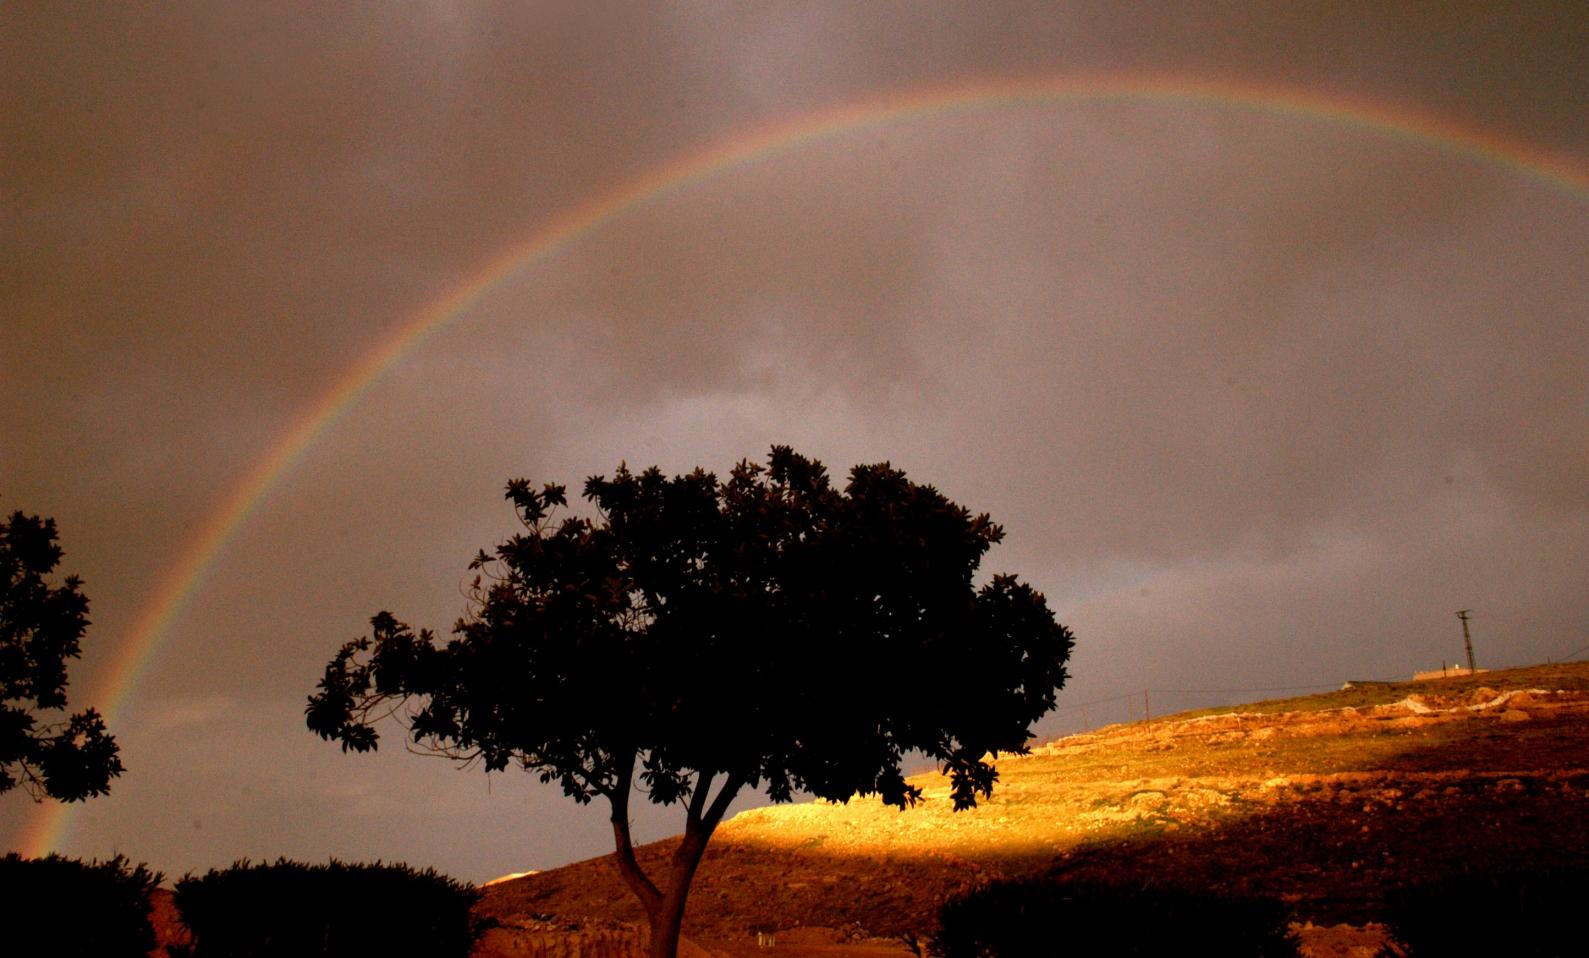 A rainbow in the Judean Desert. Photo by Yossi Zamir/FLASH90